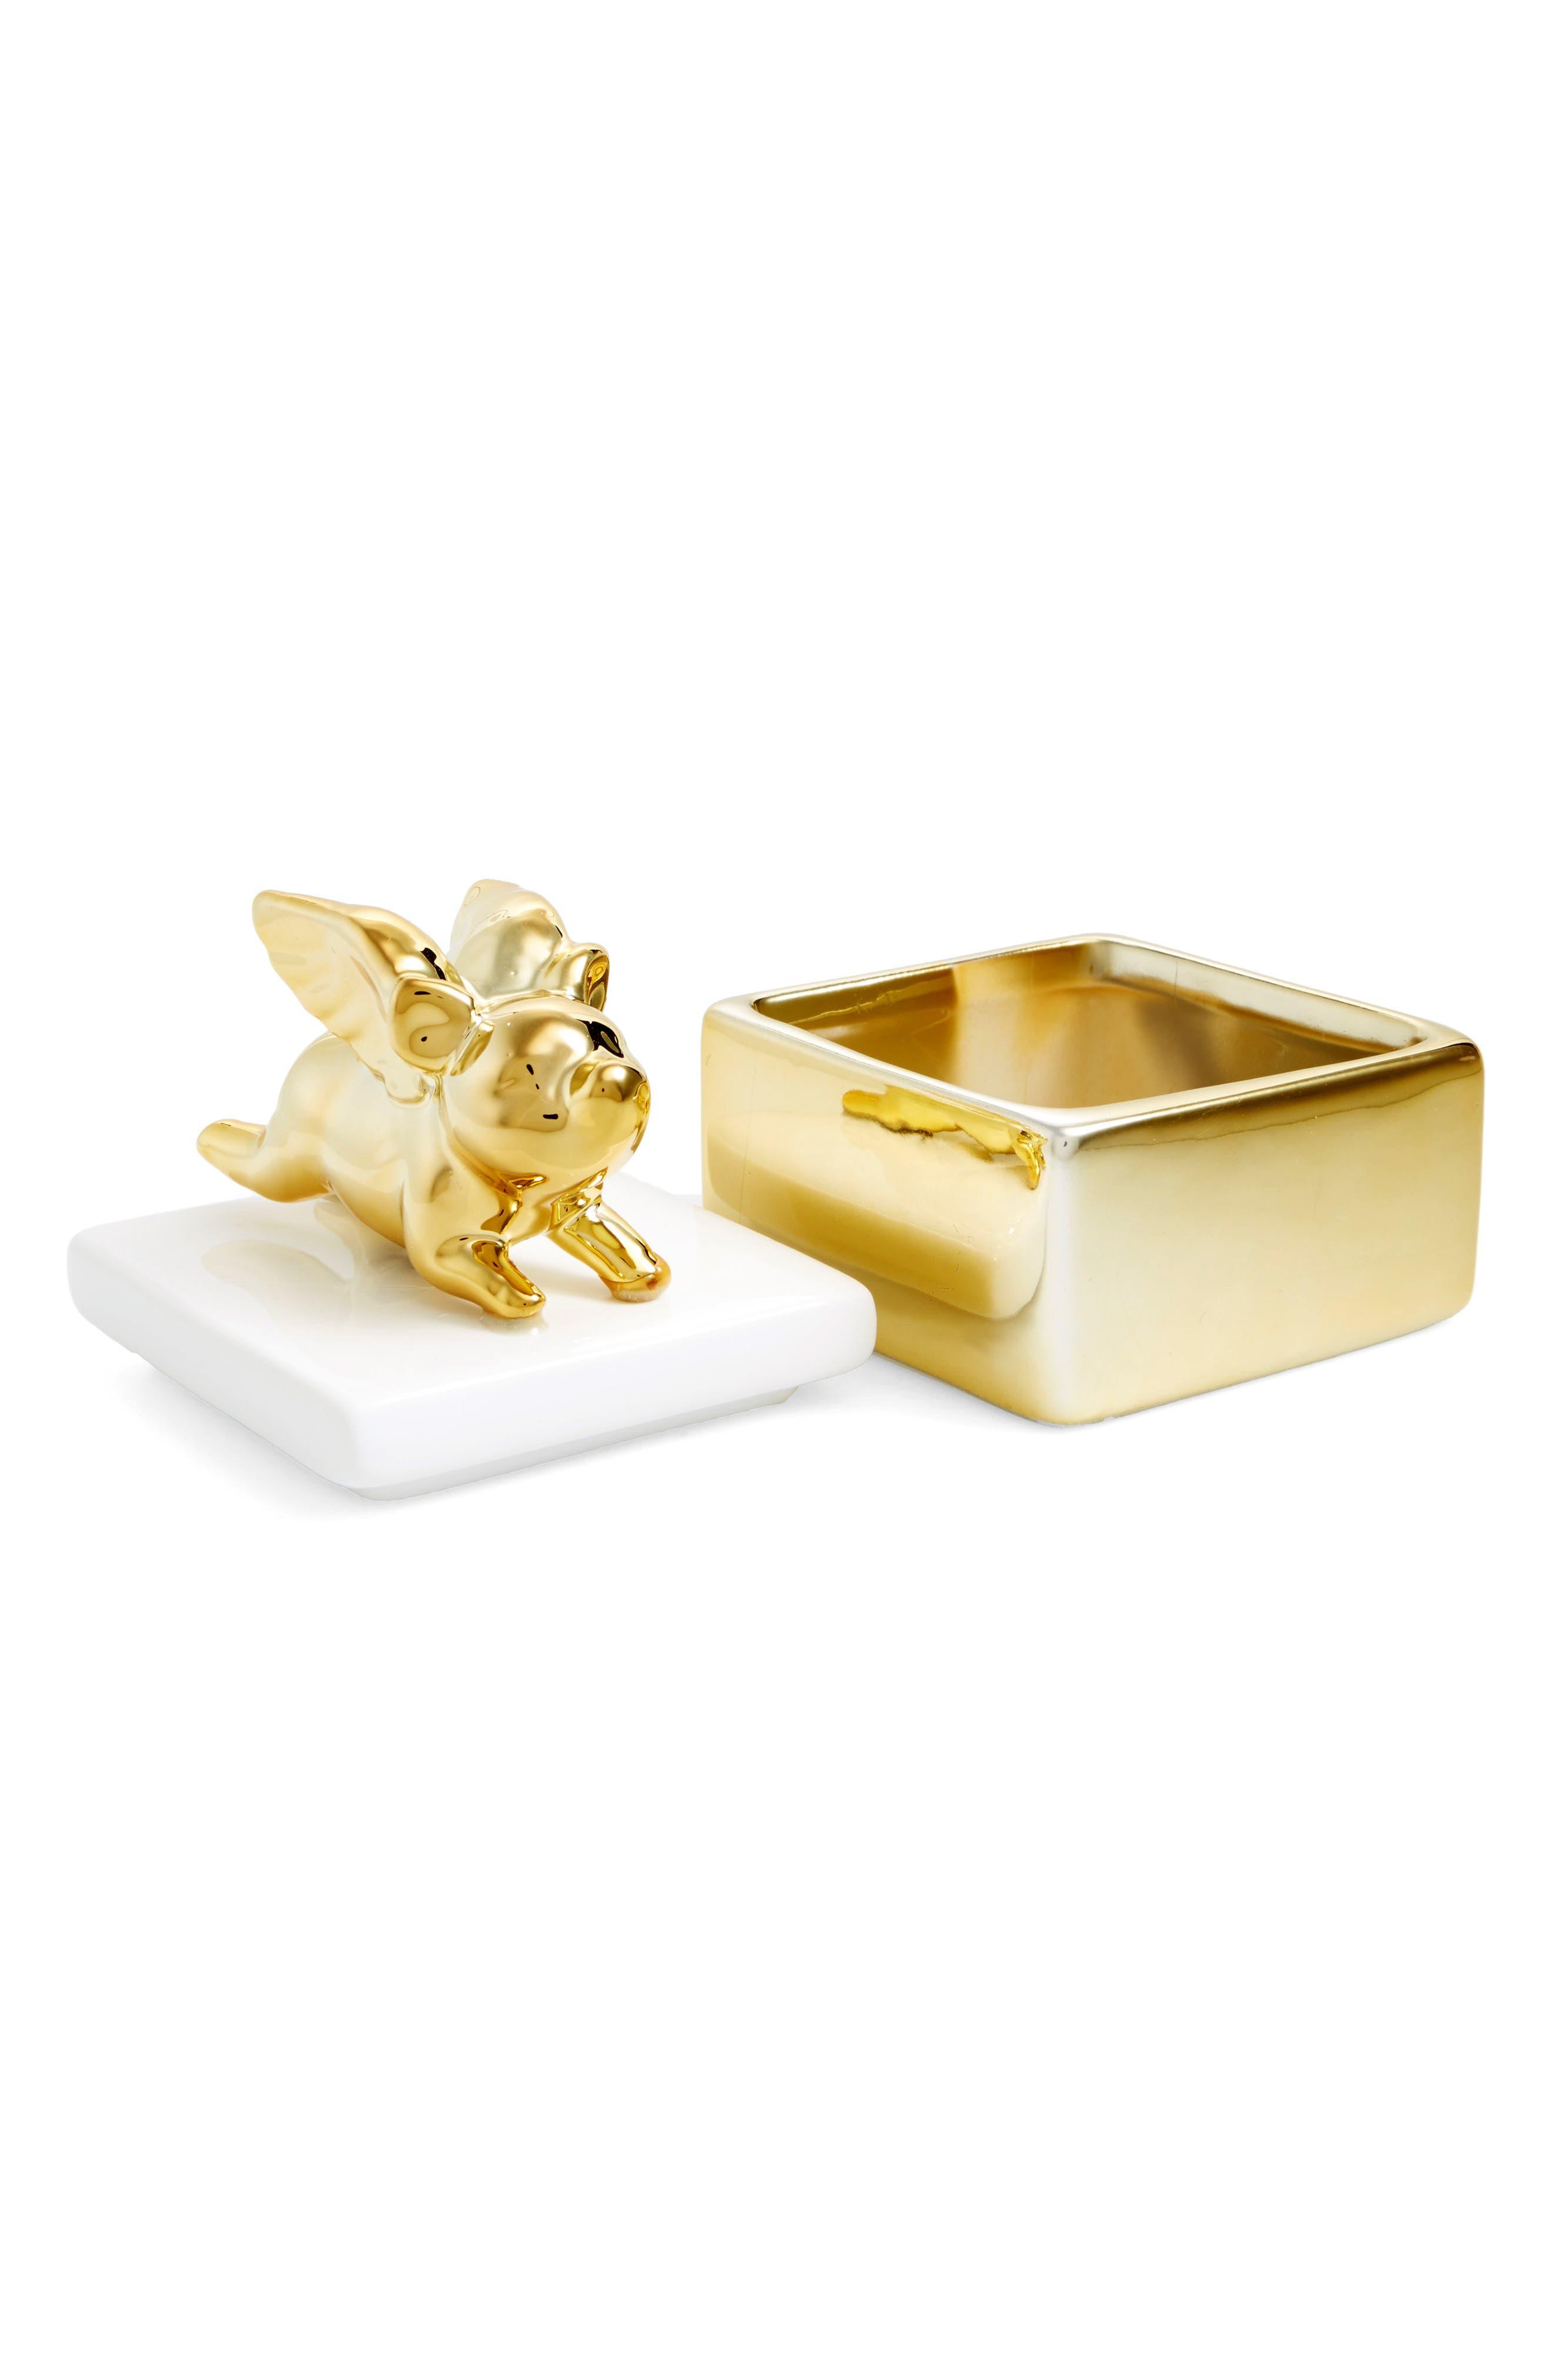 Flying Pig Trinket Box,                             Alternate thumbnail 2, color,                             Gold